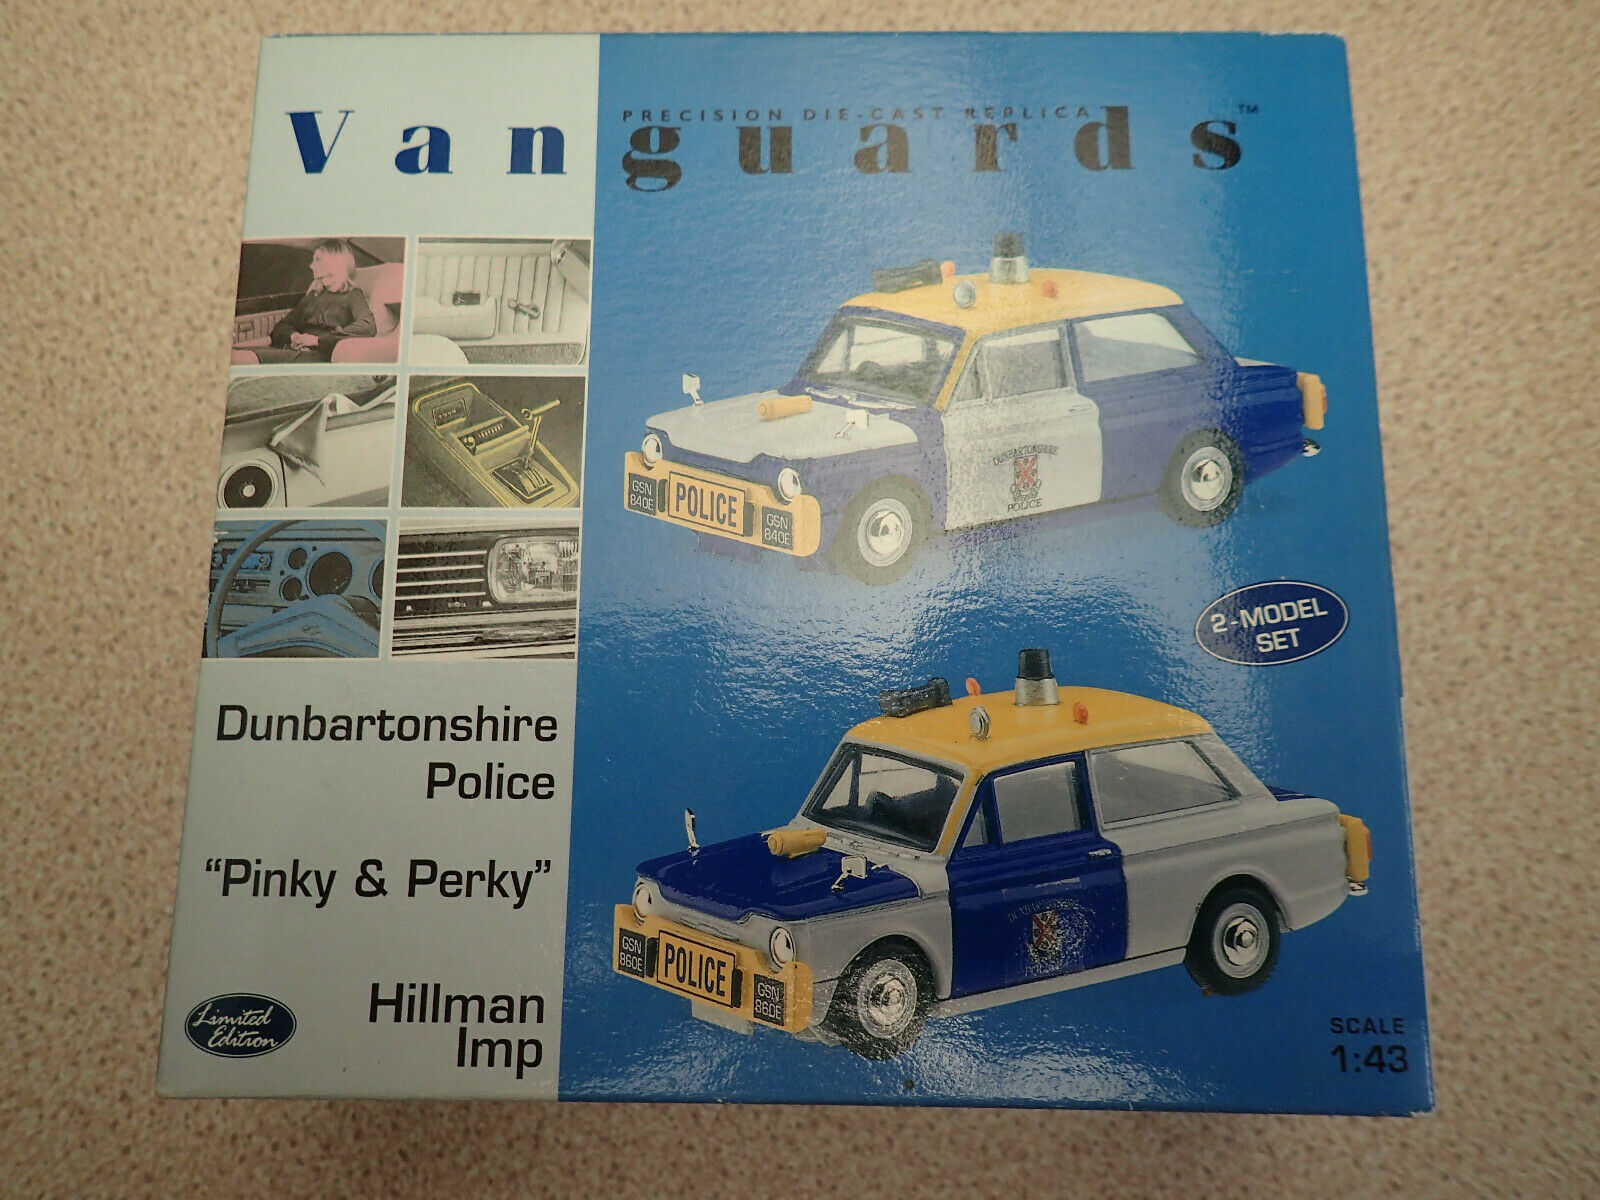 Ltd Edn Vanguards 1 43 PP1002 Dumbartonshire Police Hillman Imp Set Untouched